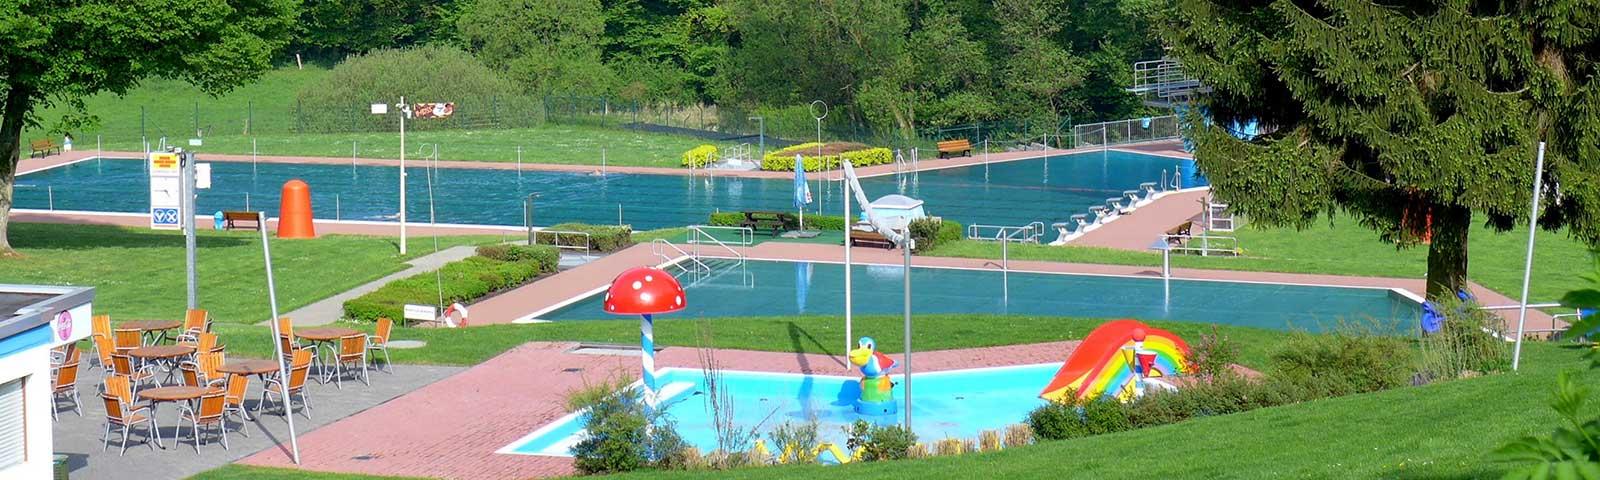 Rengsdorf schwimmbad freibad